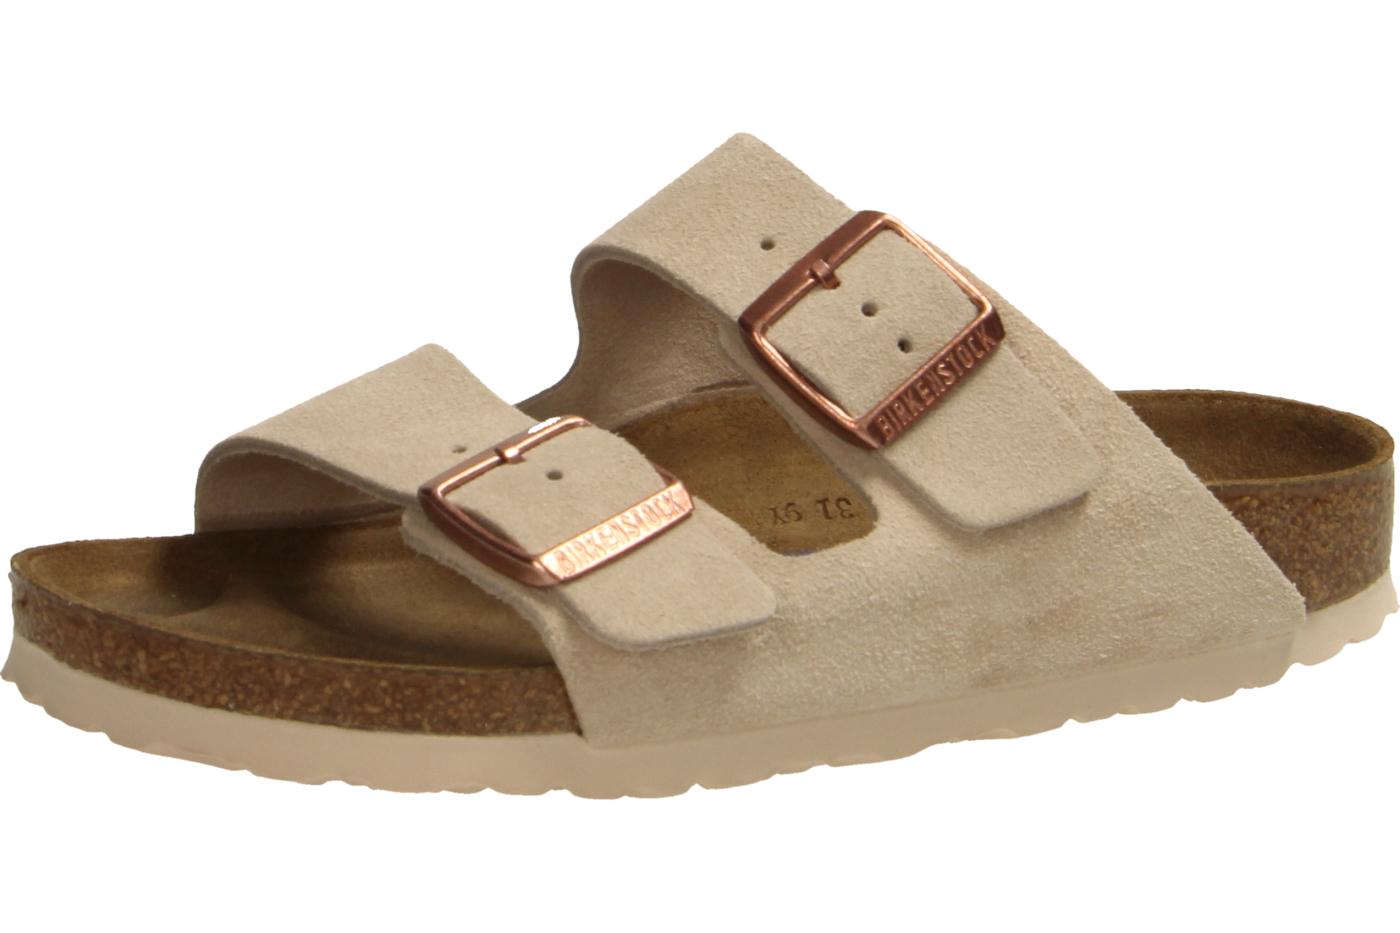 Birkenstock Arizona BS[Slipper] Pantolette Pantolette 1014207 37